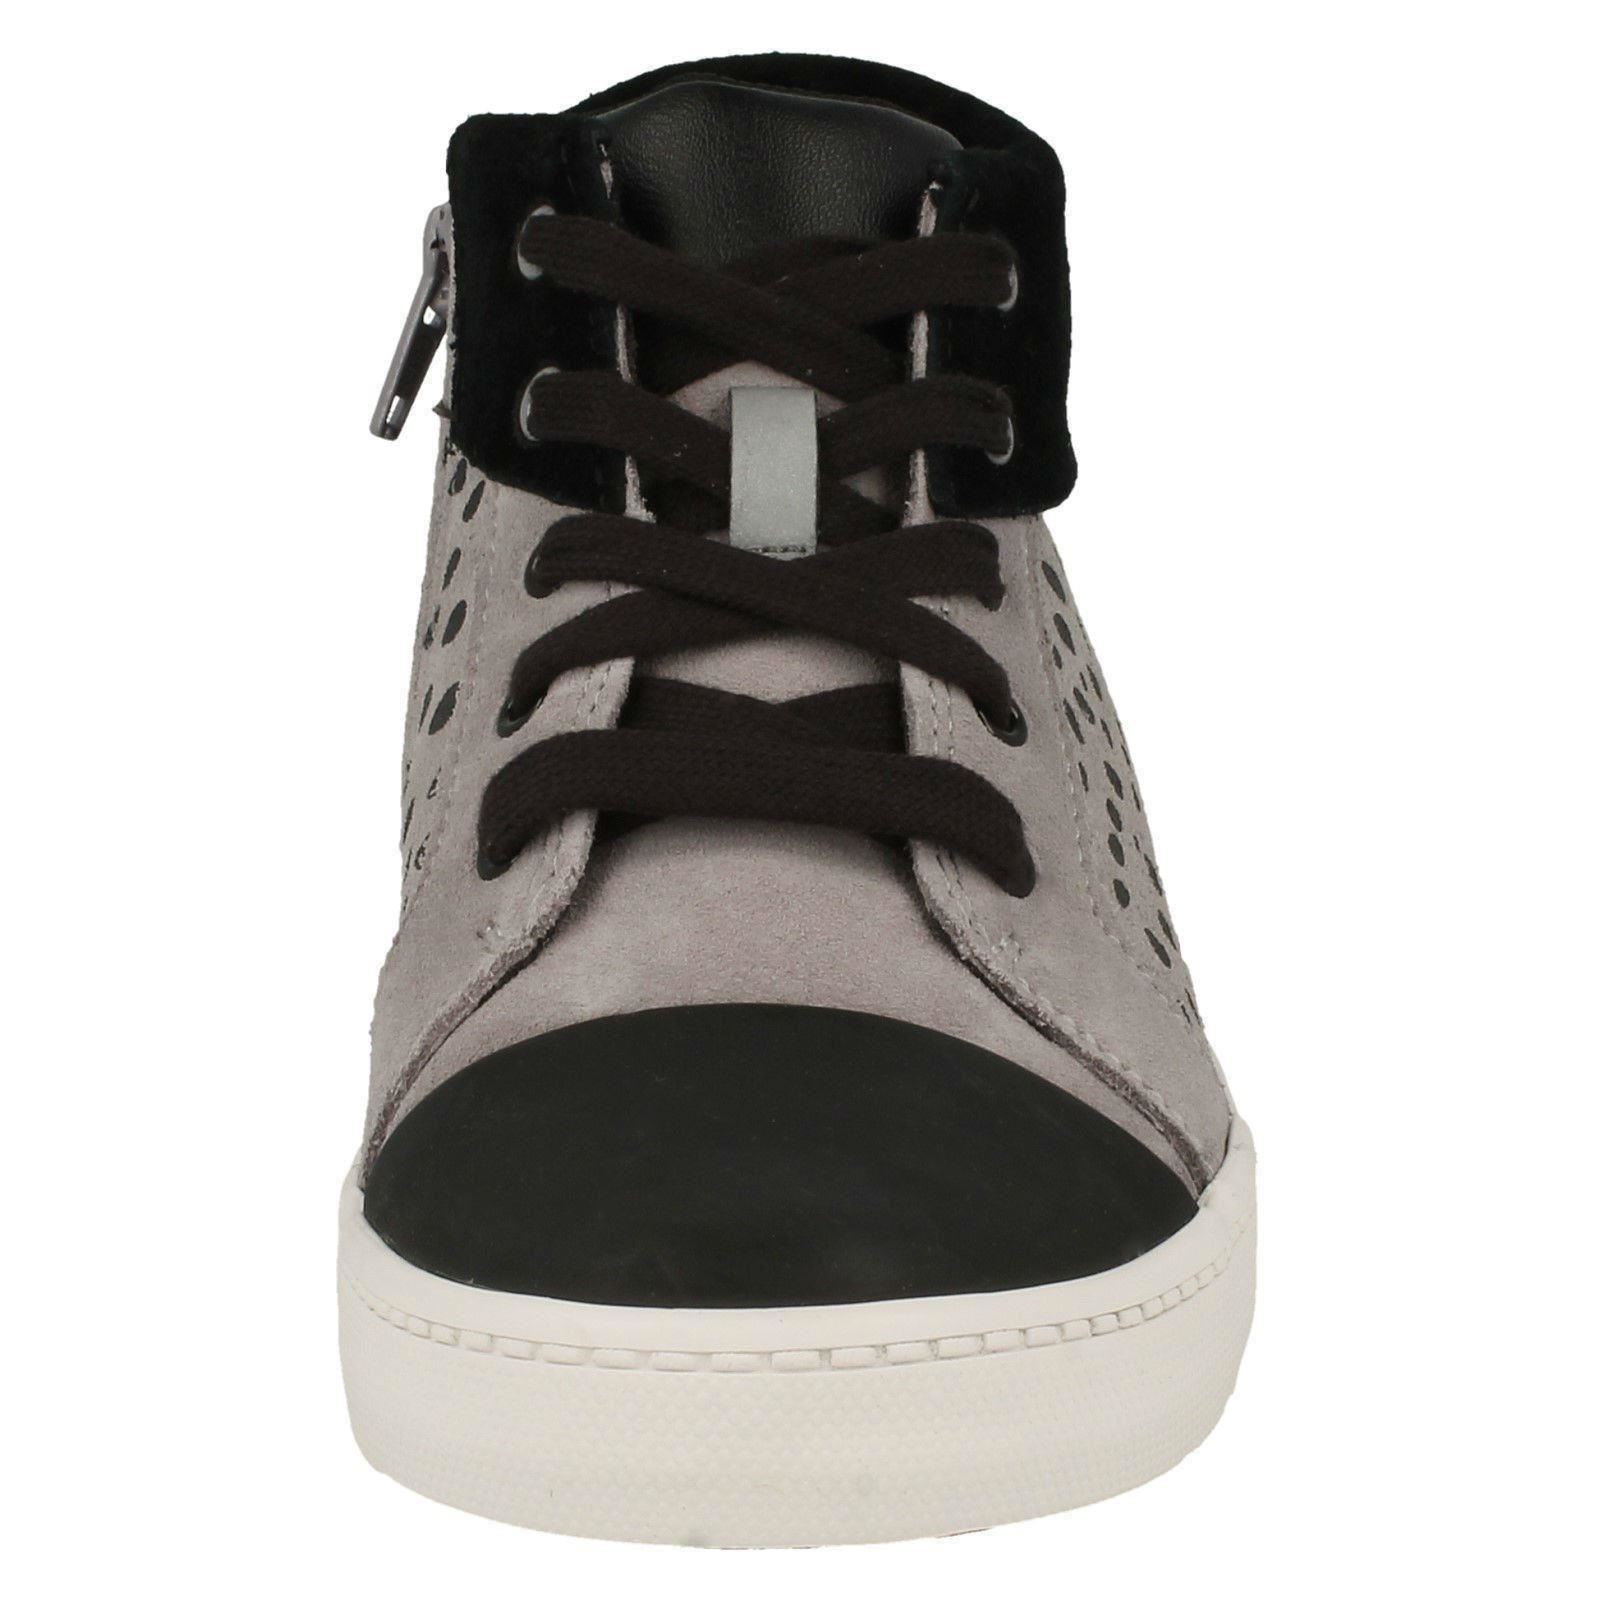 Boys Clarks Spotty Detail Ankle Boots City Vine Hi